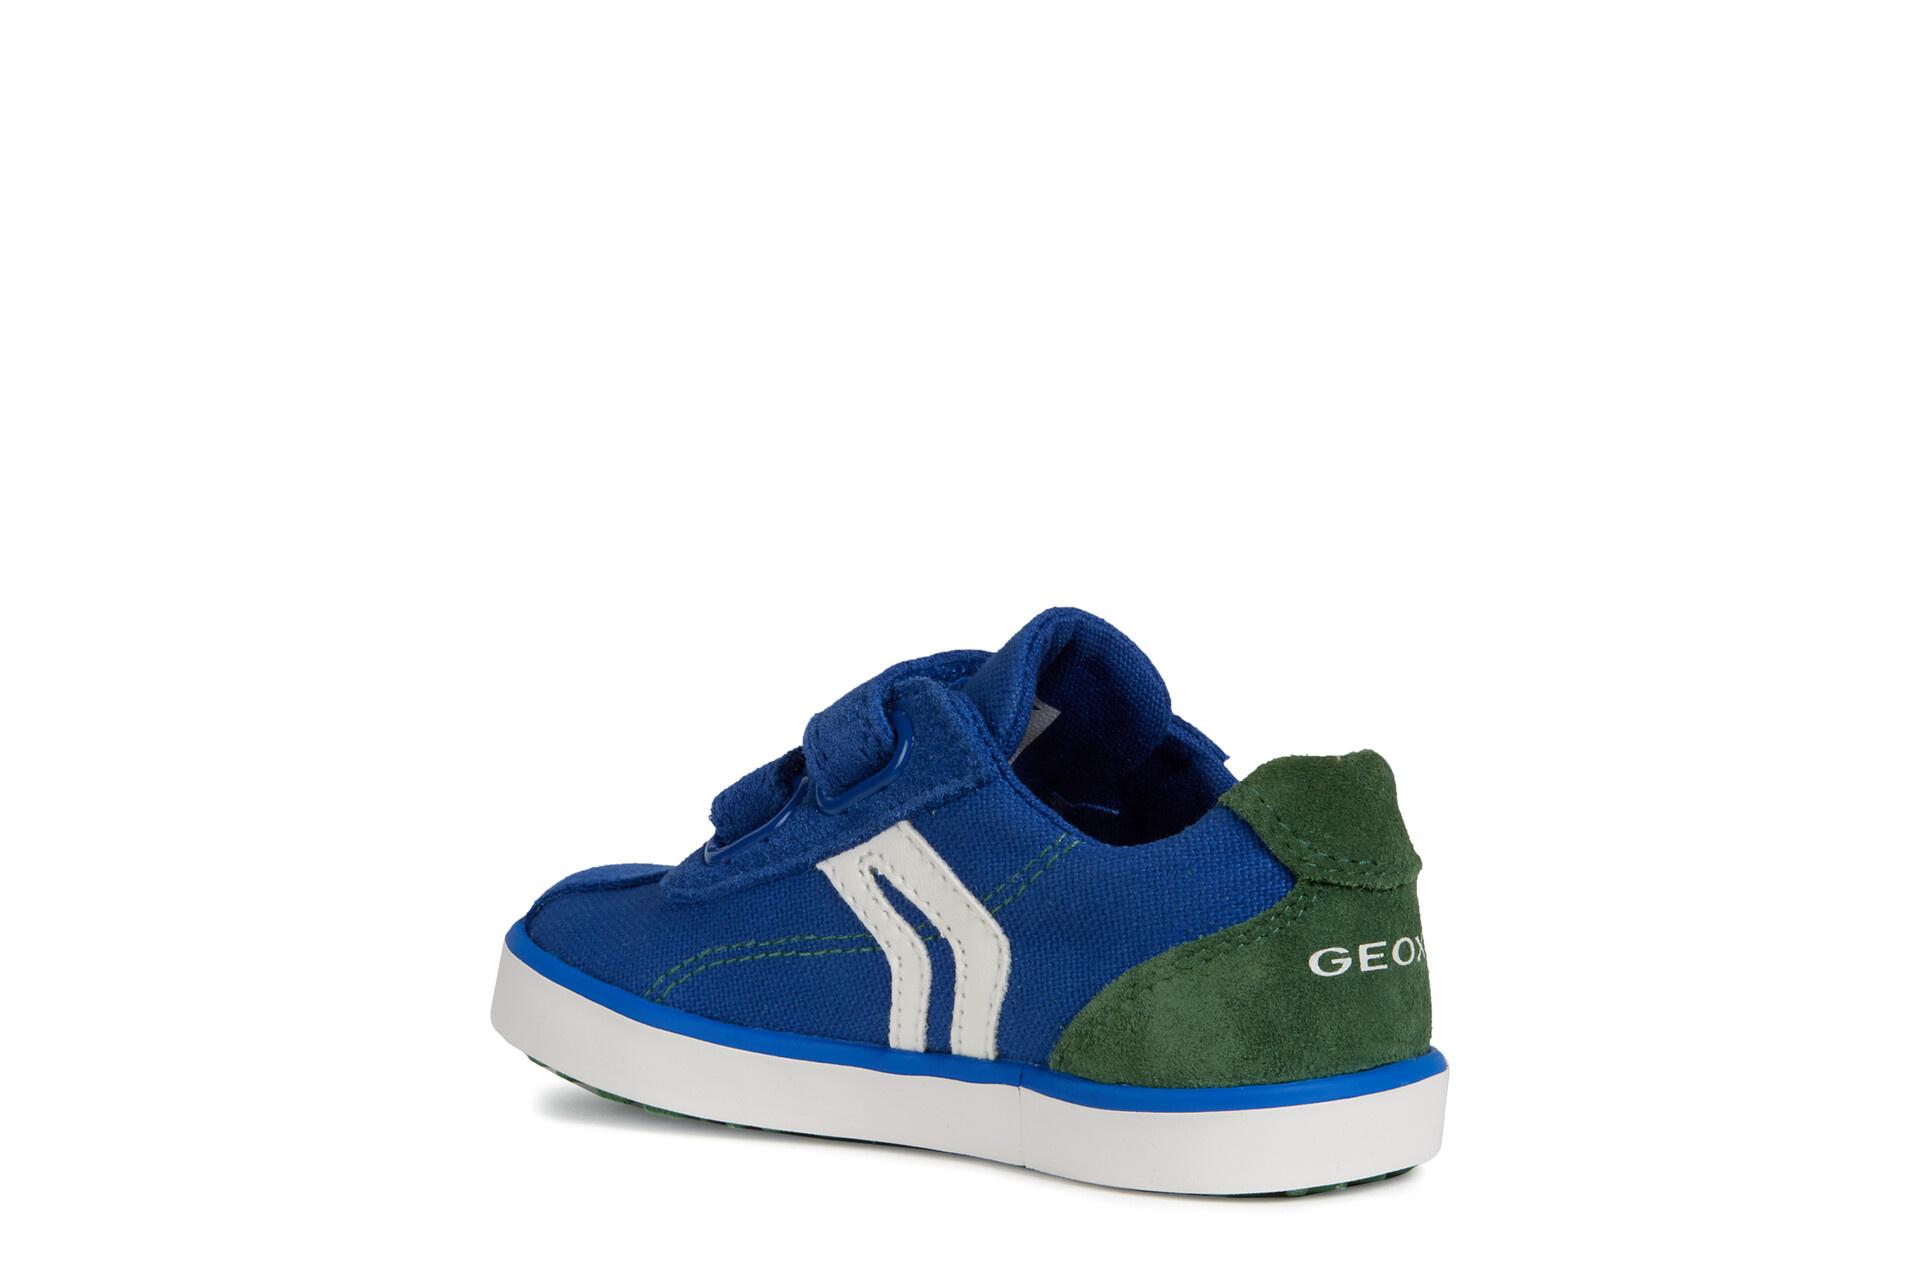 Geox Kilwi Royal Green